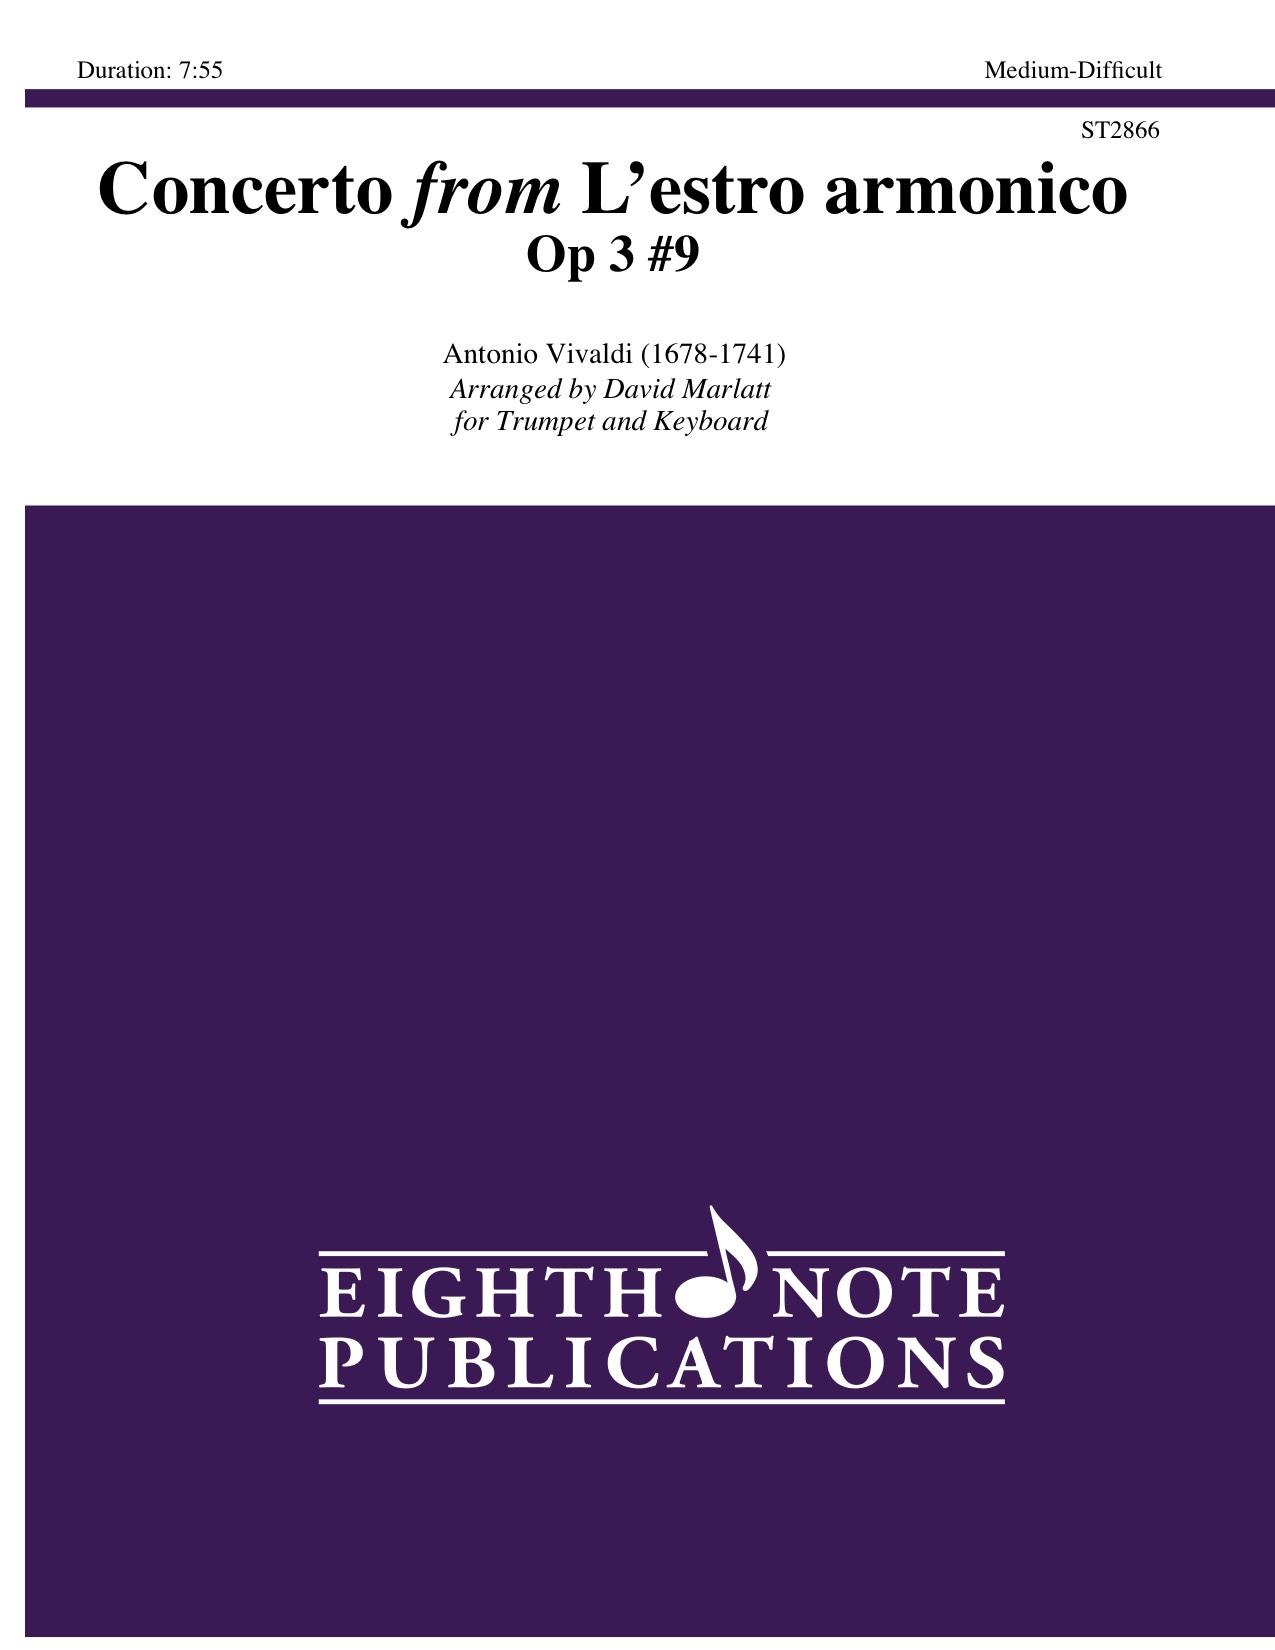 Concerto from Lestro armonico Op 3 #9 - Antonio Vivaldi